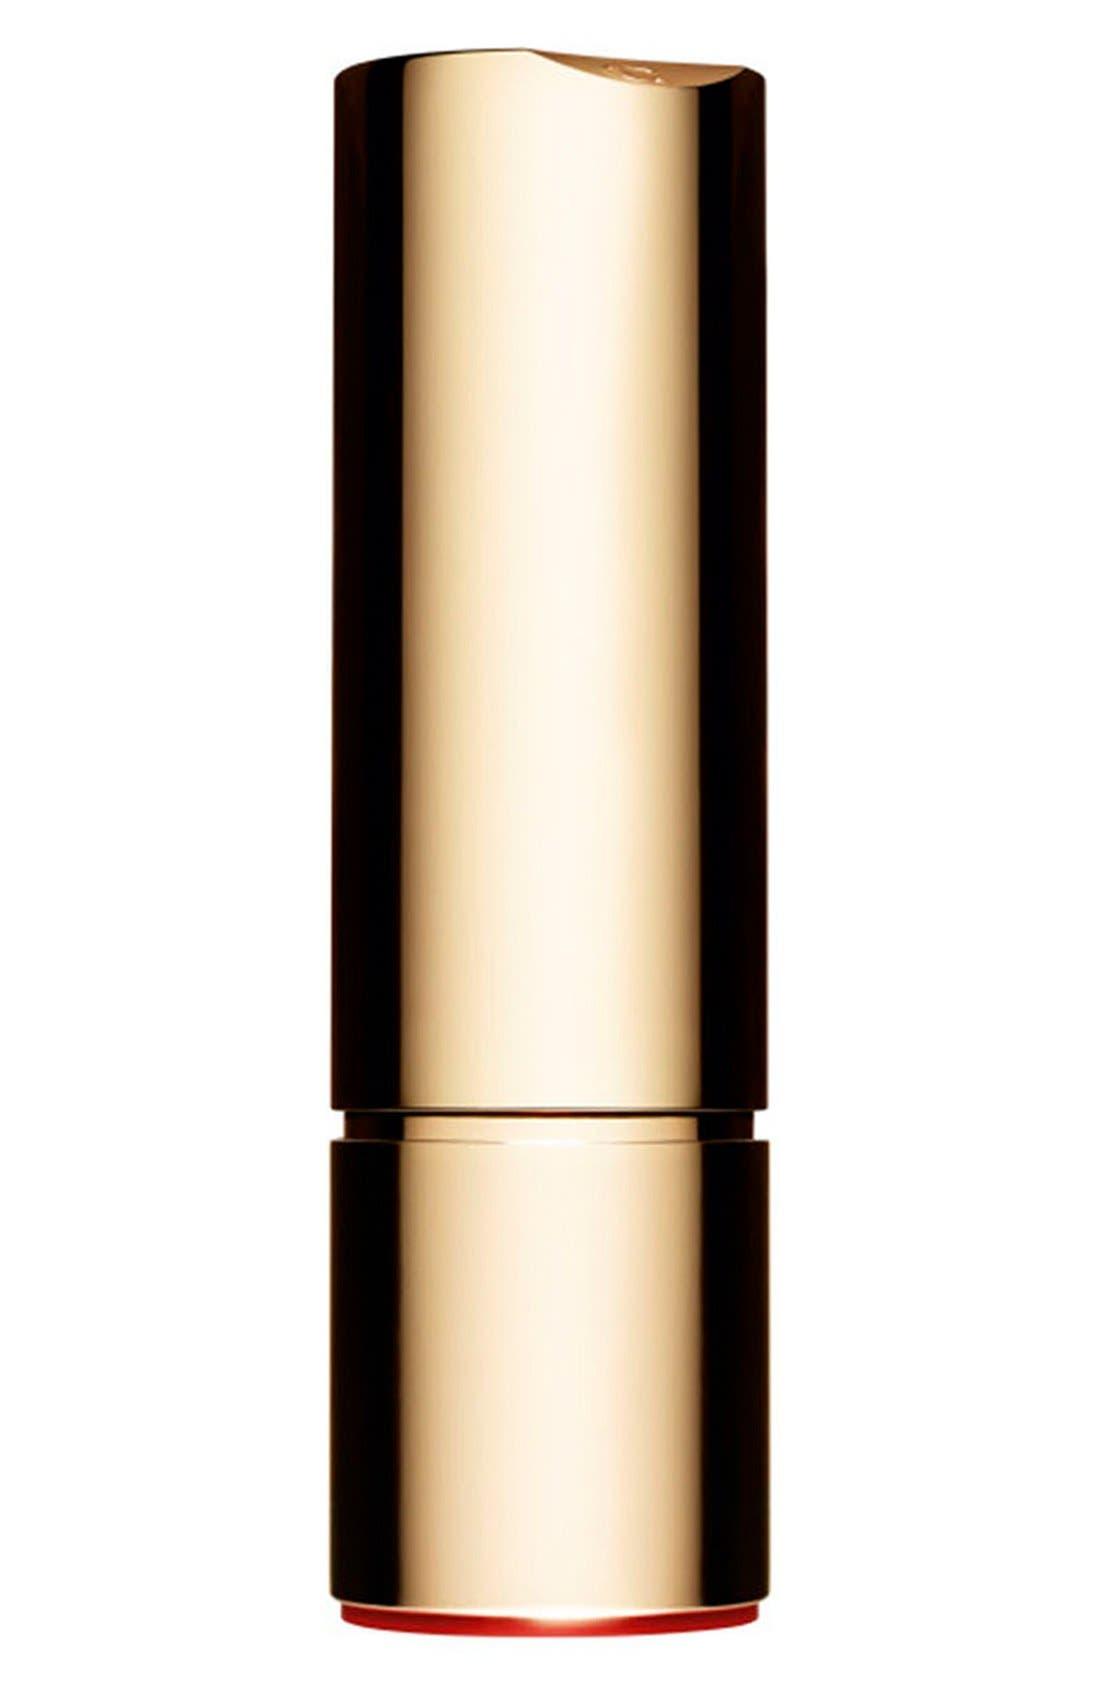 Joli Rouge Lipstick,                             Main thumbnail 1, color,                             737 SPICY CINNAMON